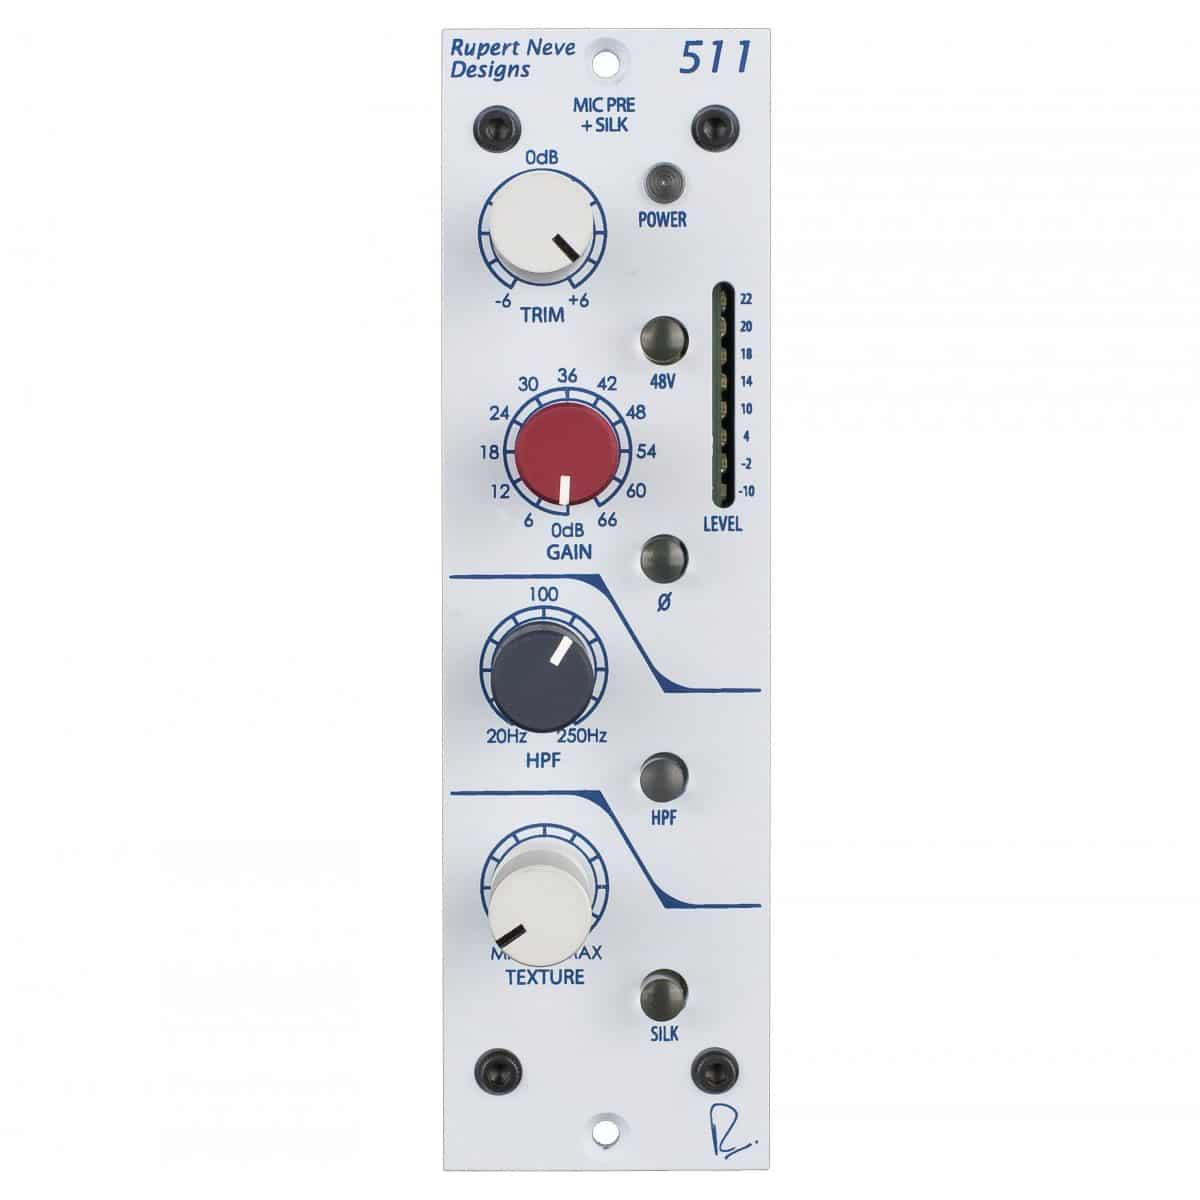 Rupert Neve 542 01 Effetti, Pro Audio, Outboard, Compressori